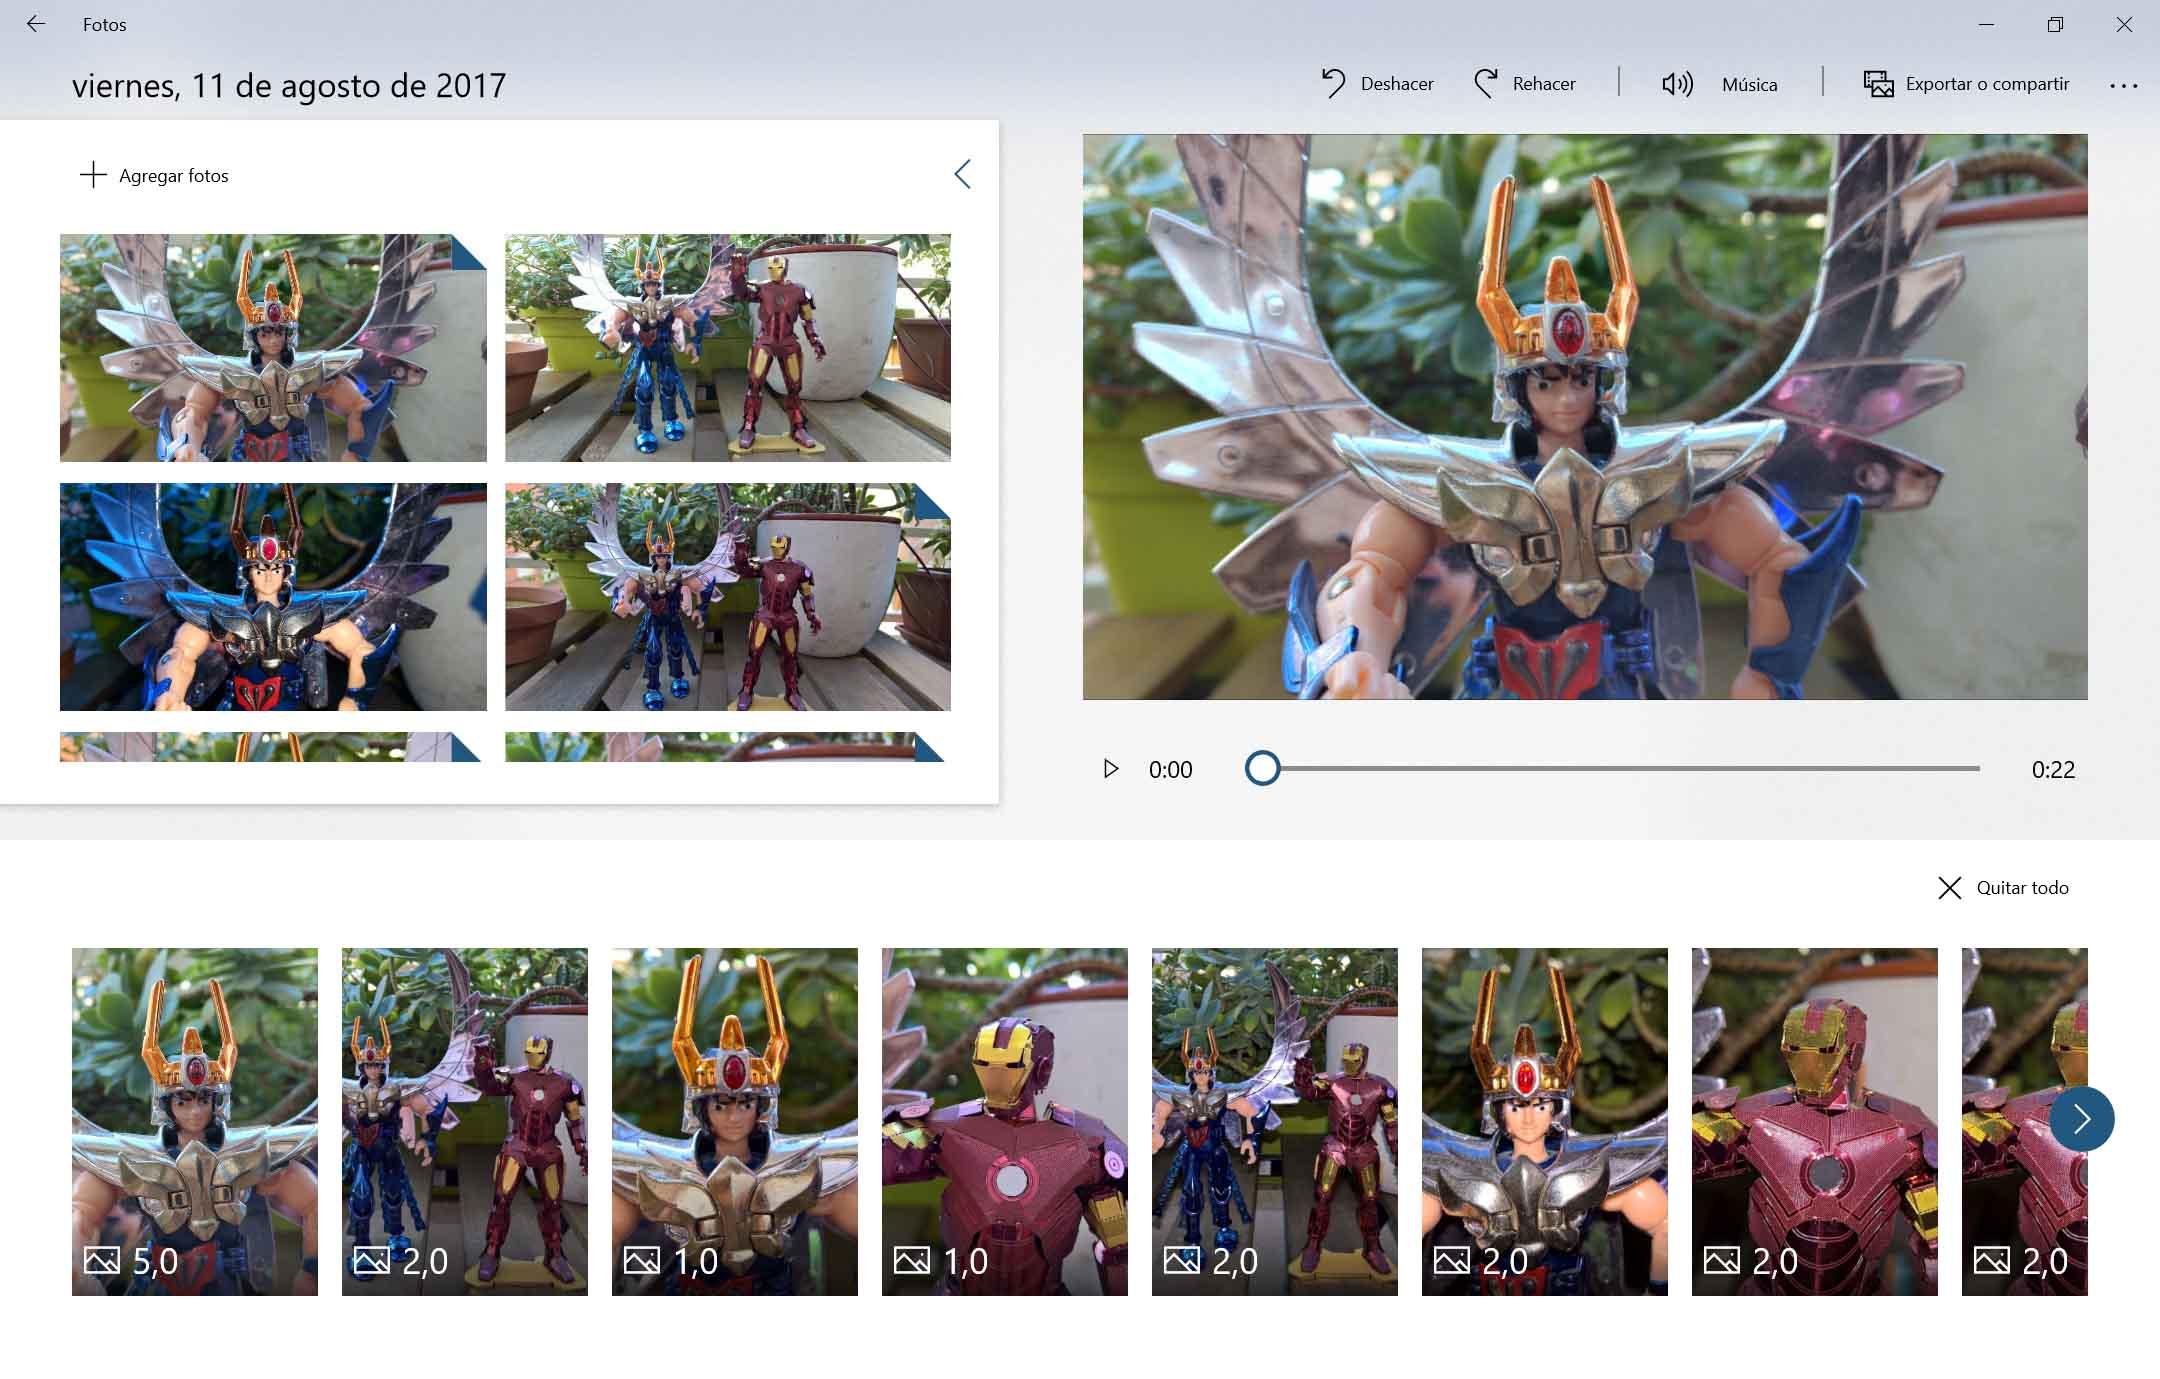 App Fotos 2